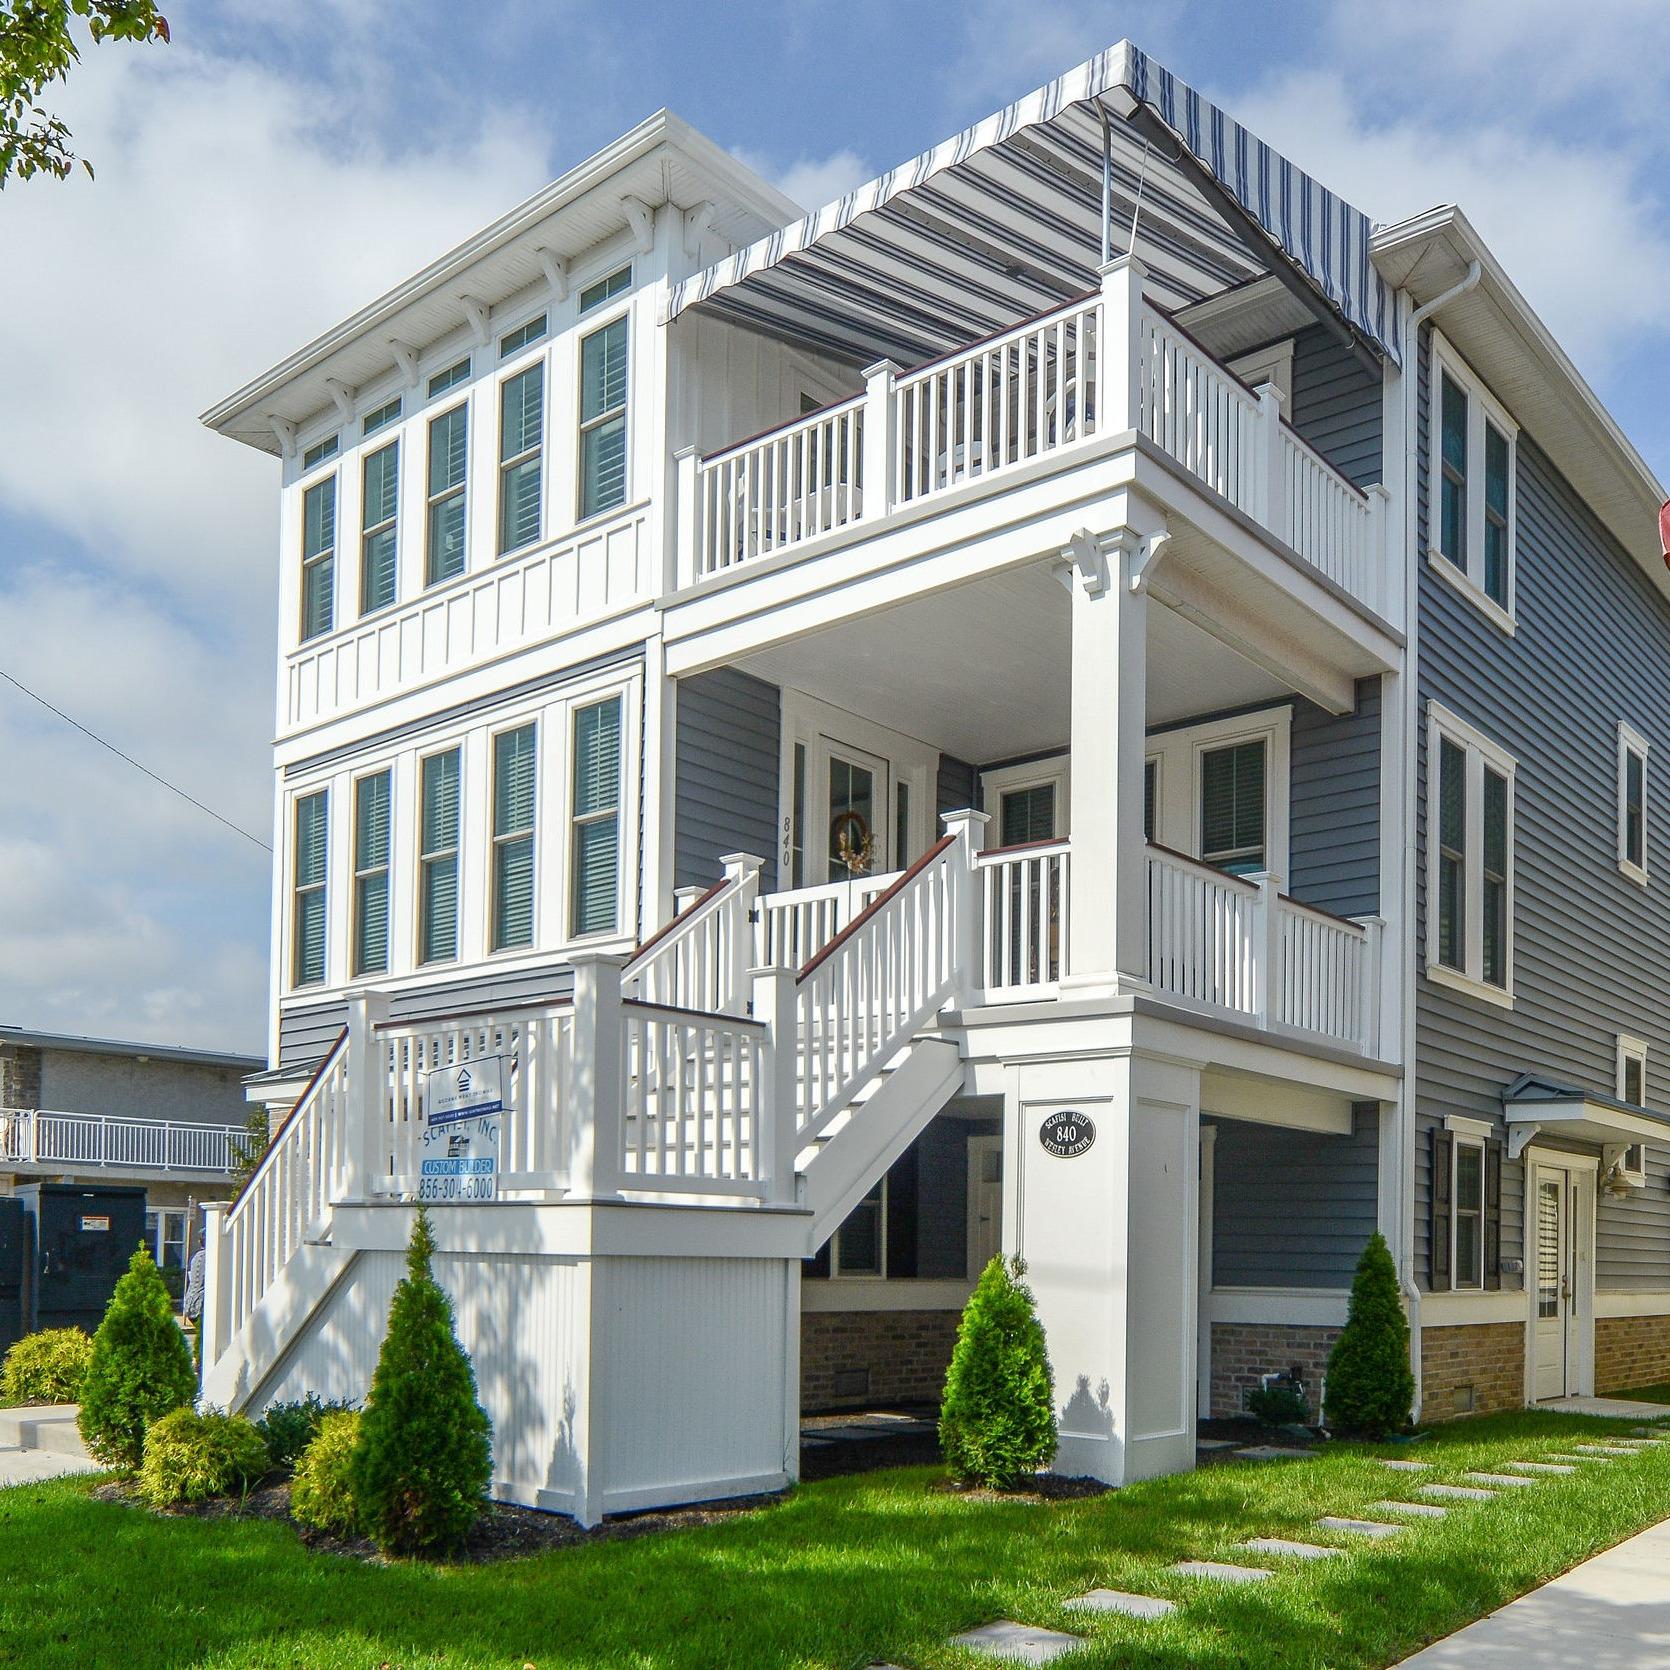 Amazing beach house rentals in NJ | Vrbo